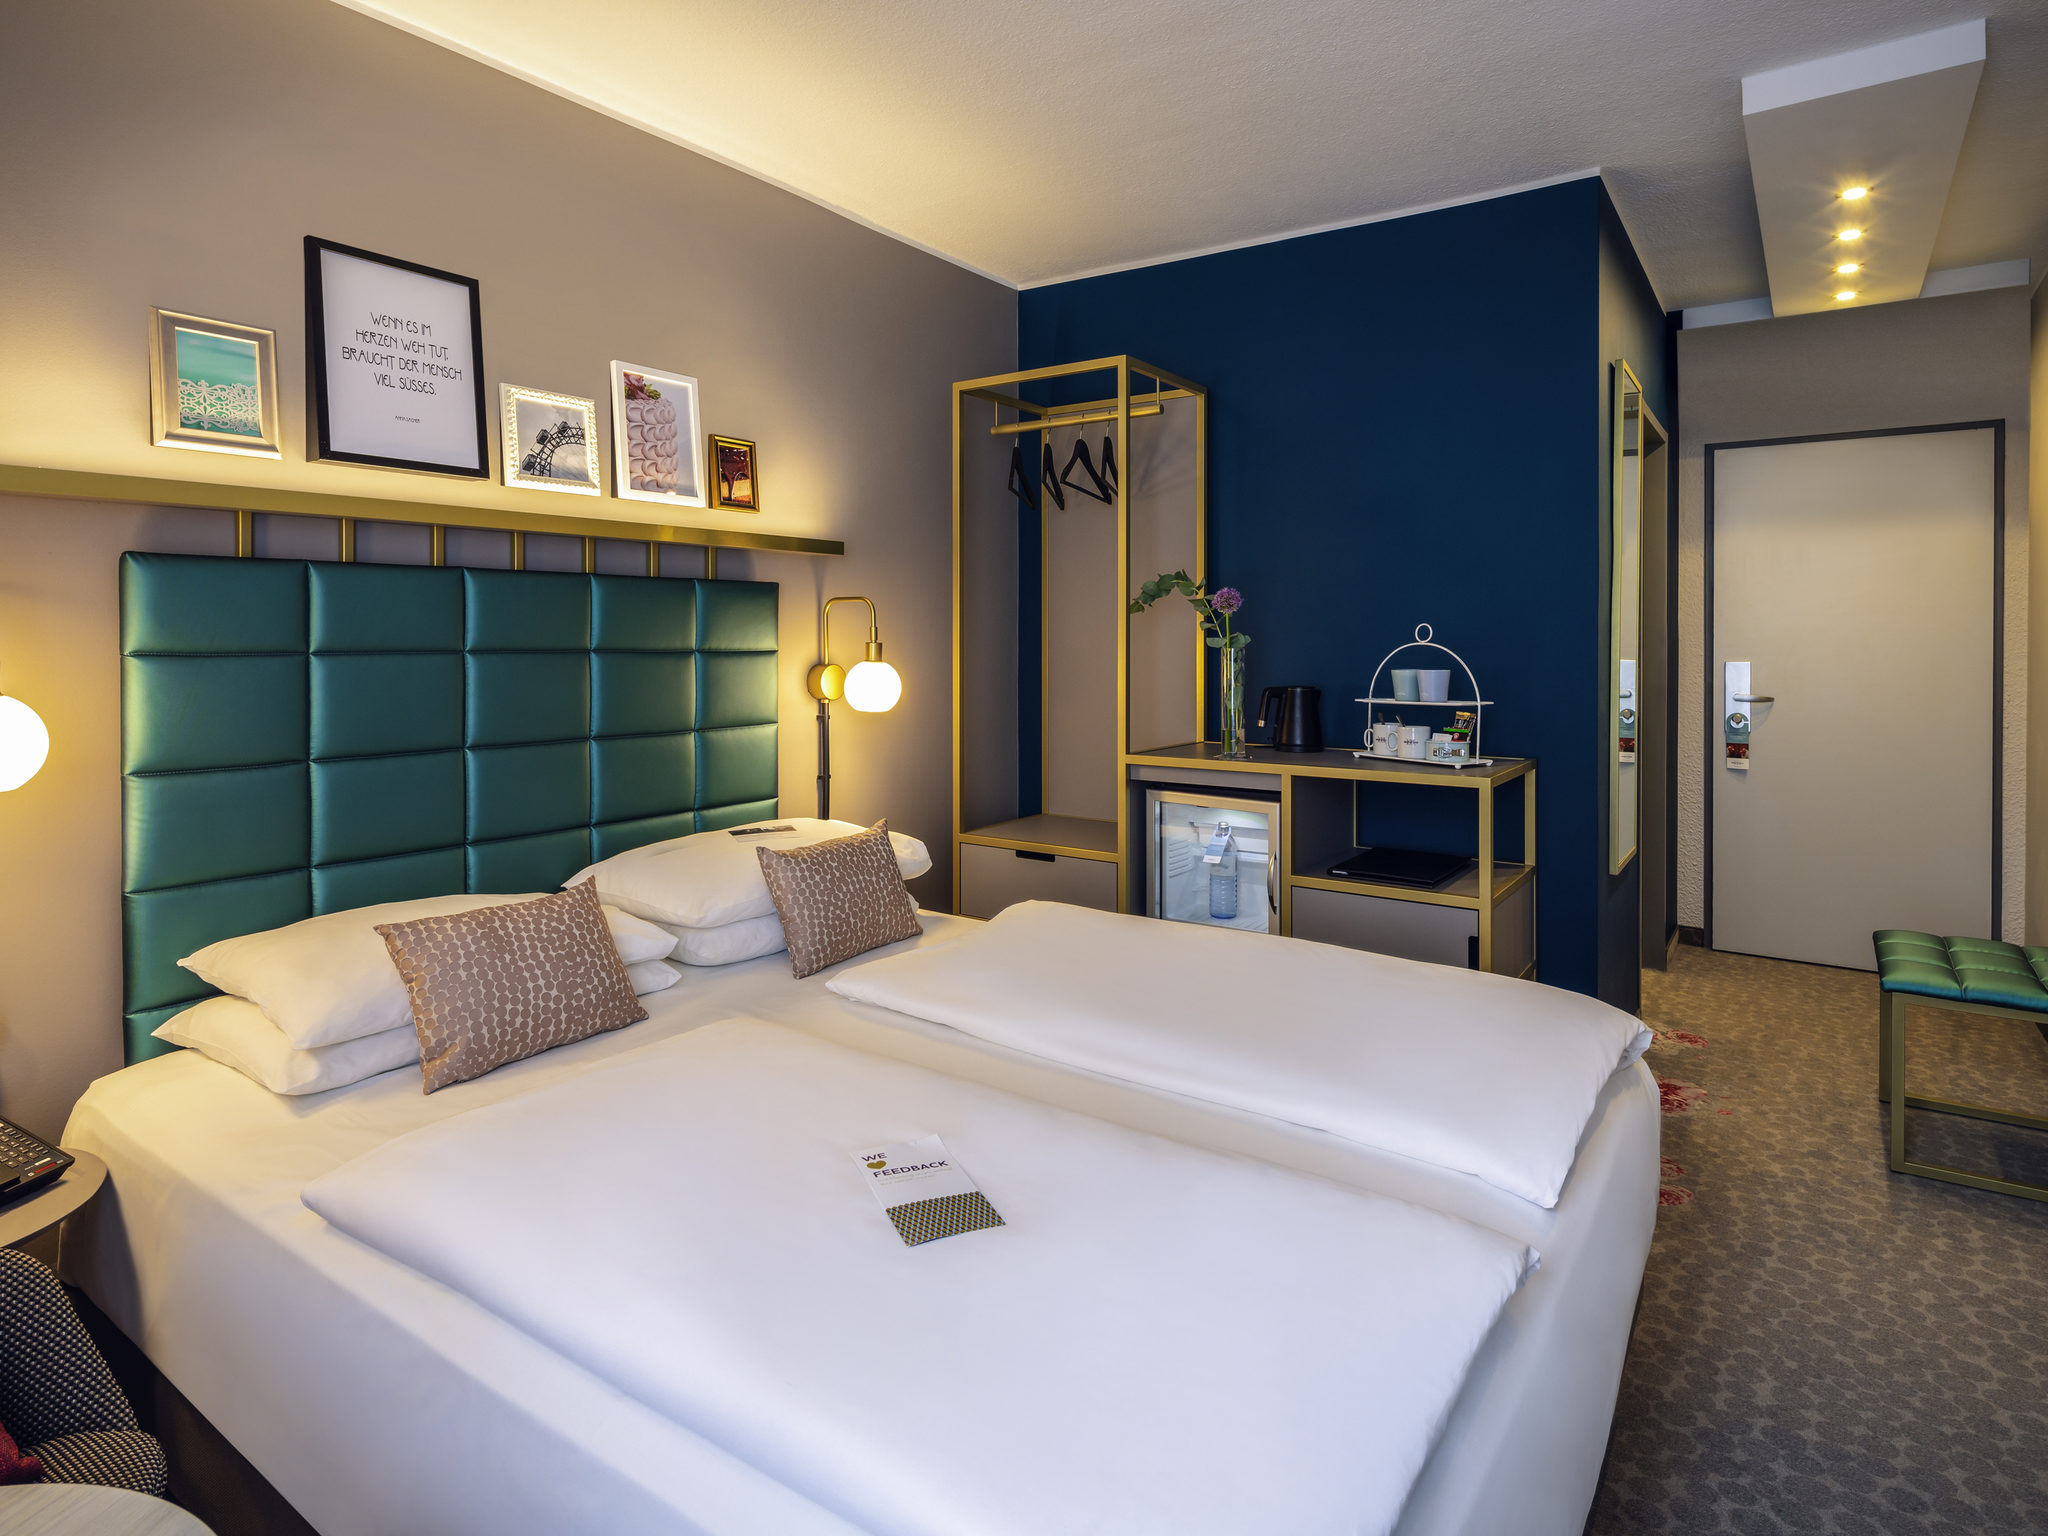 Hotel - Hotel Mercure Wien Zentrum